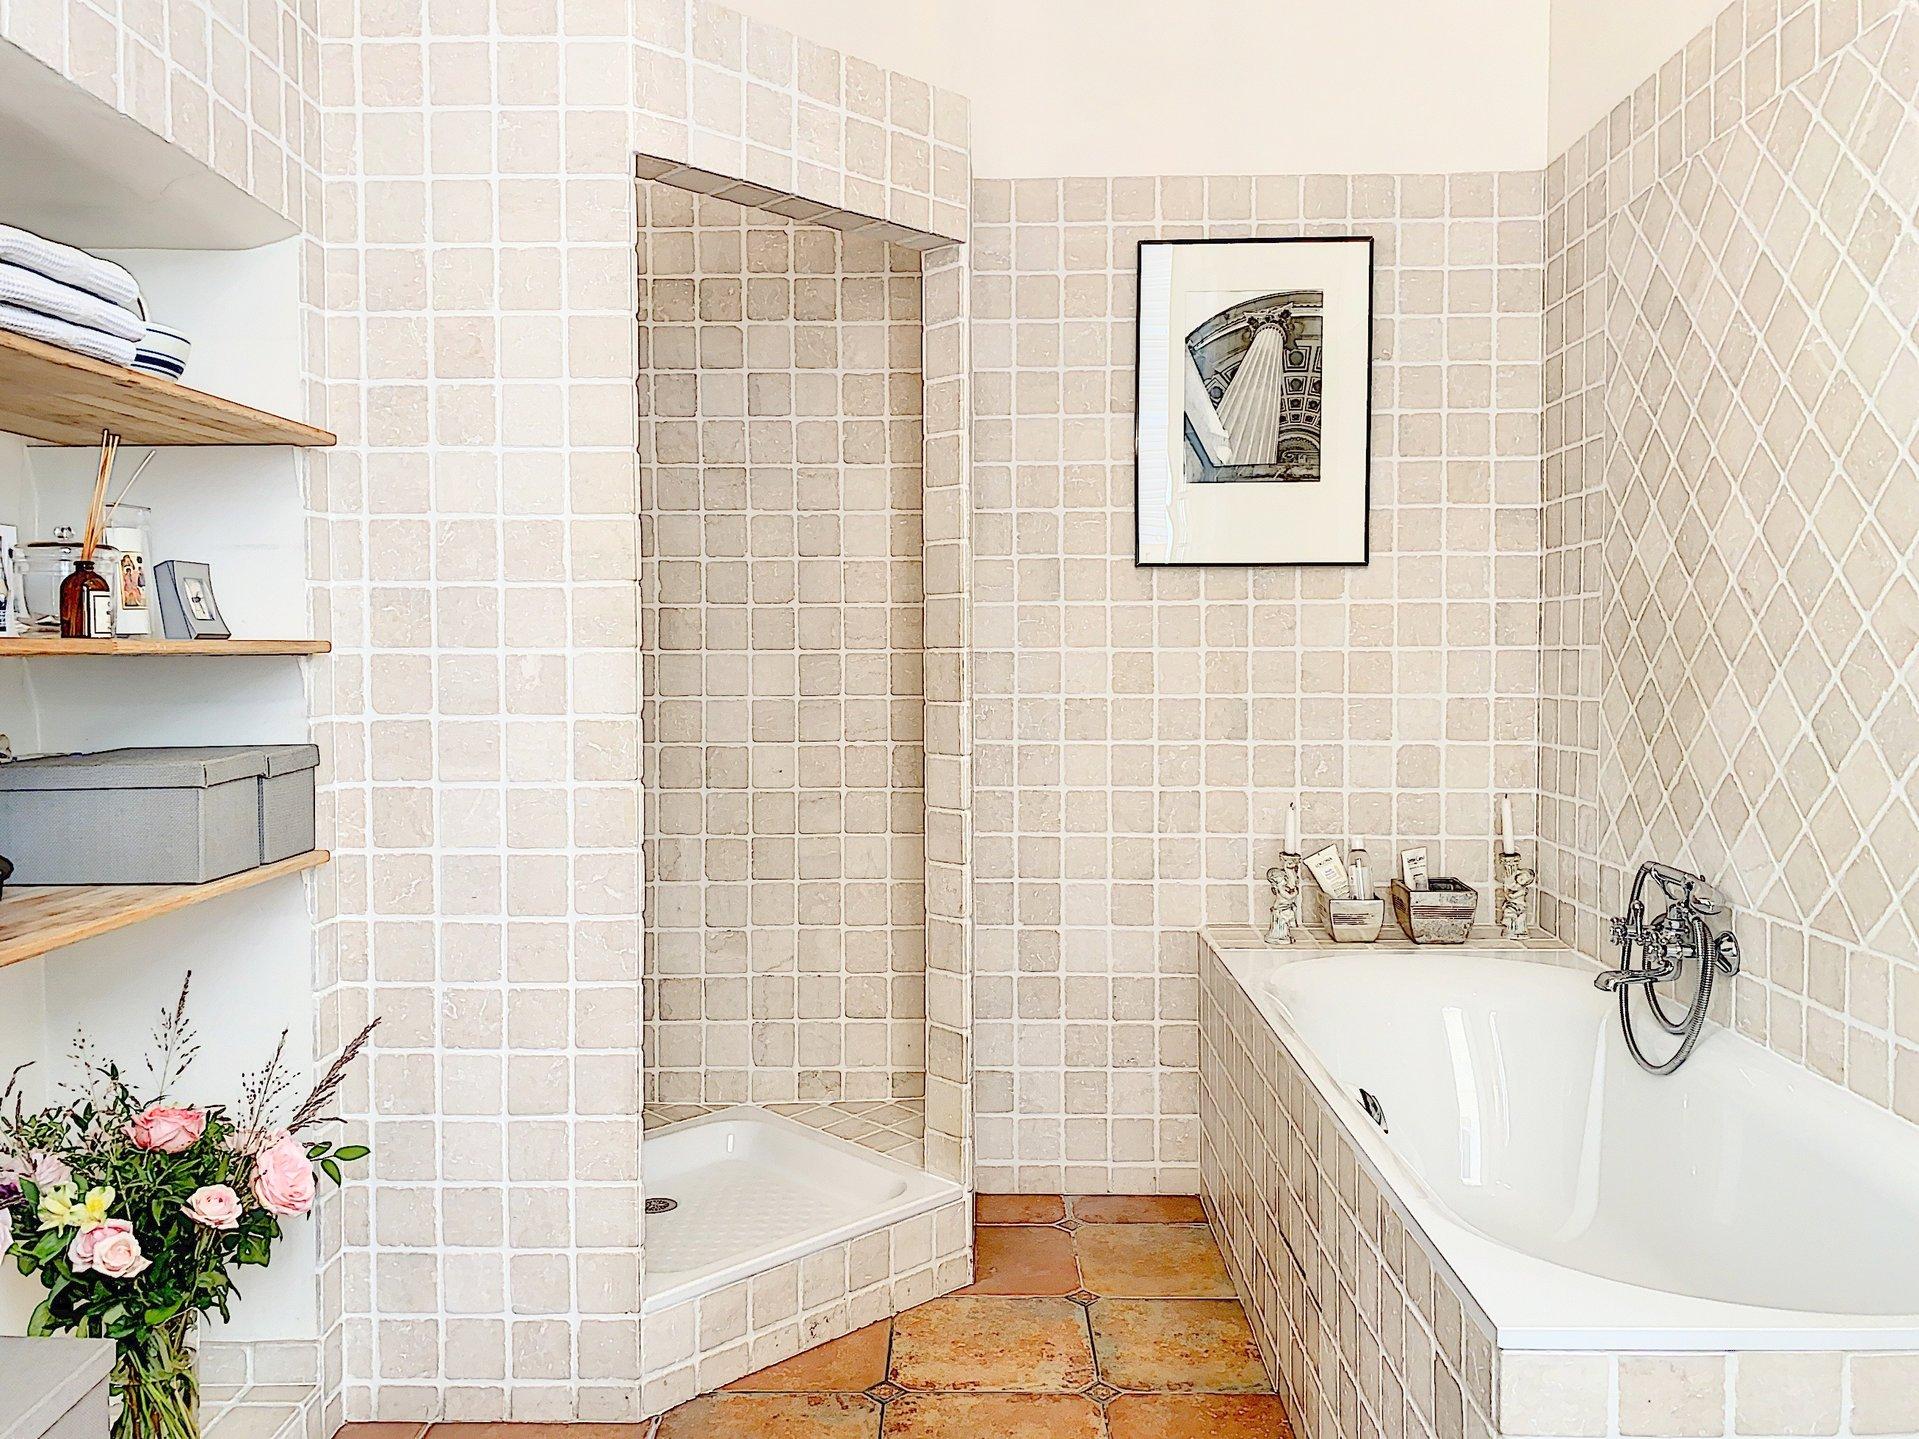 VENTE Appartement 3P 91m² Nice Vieille Ville Balcon